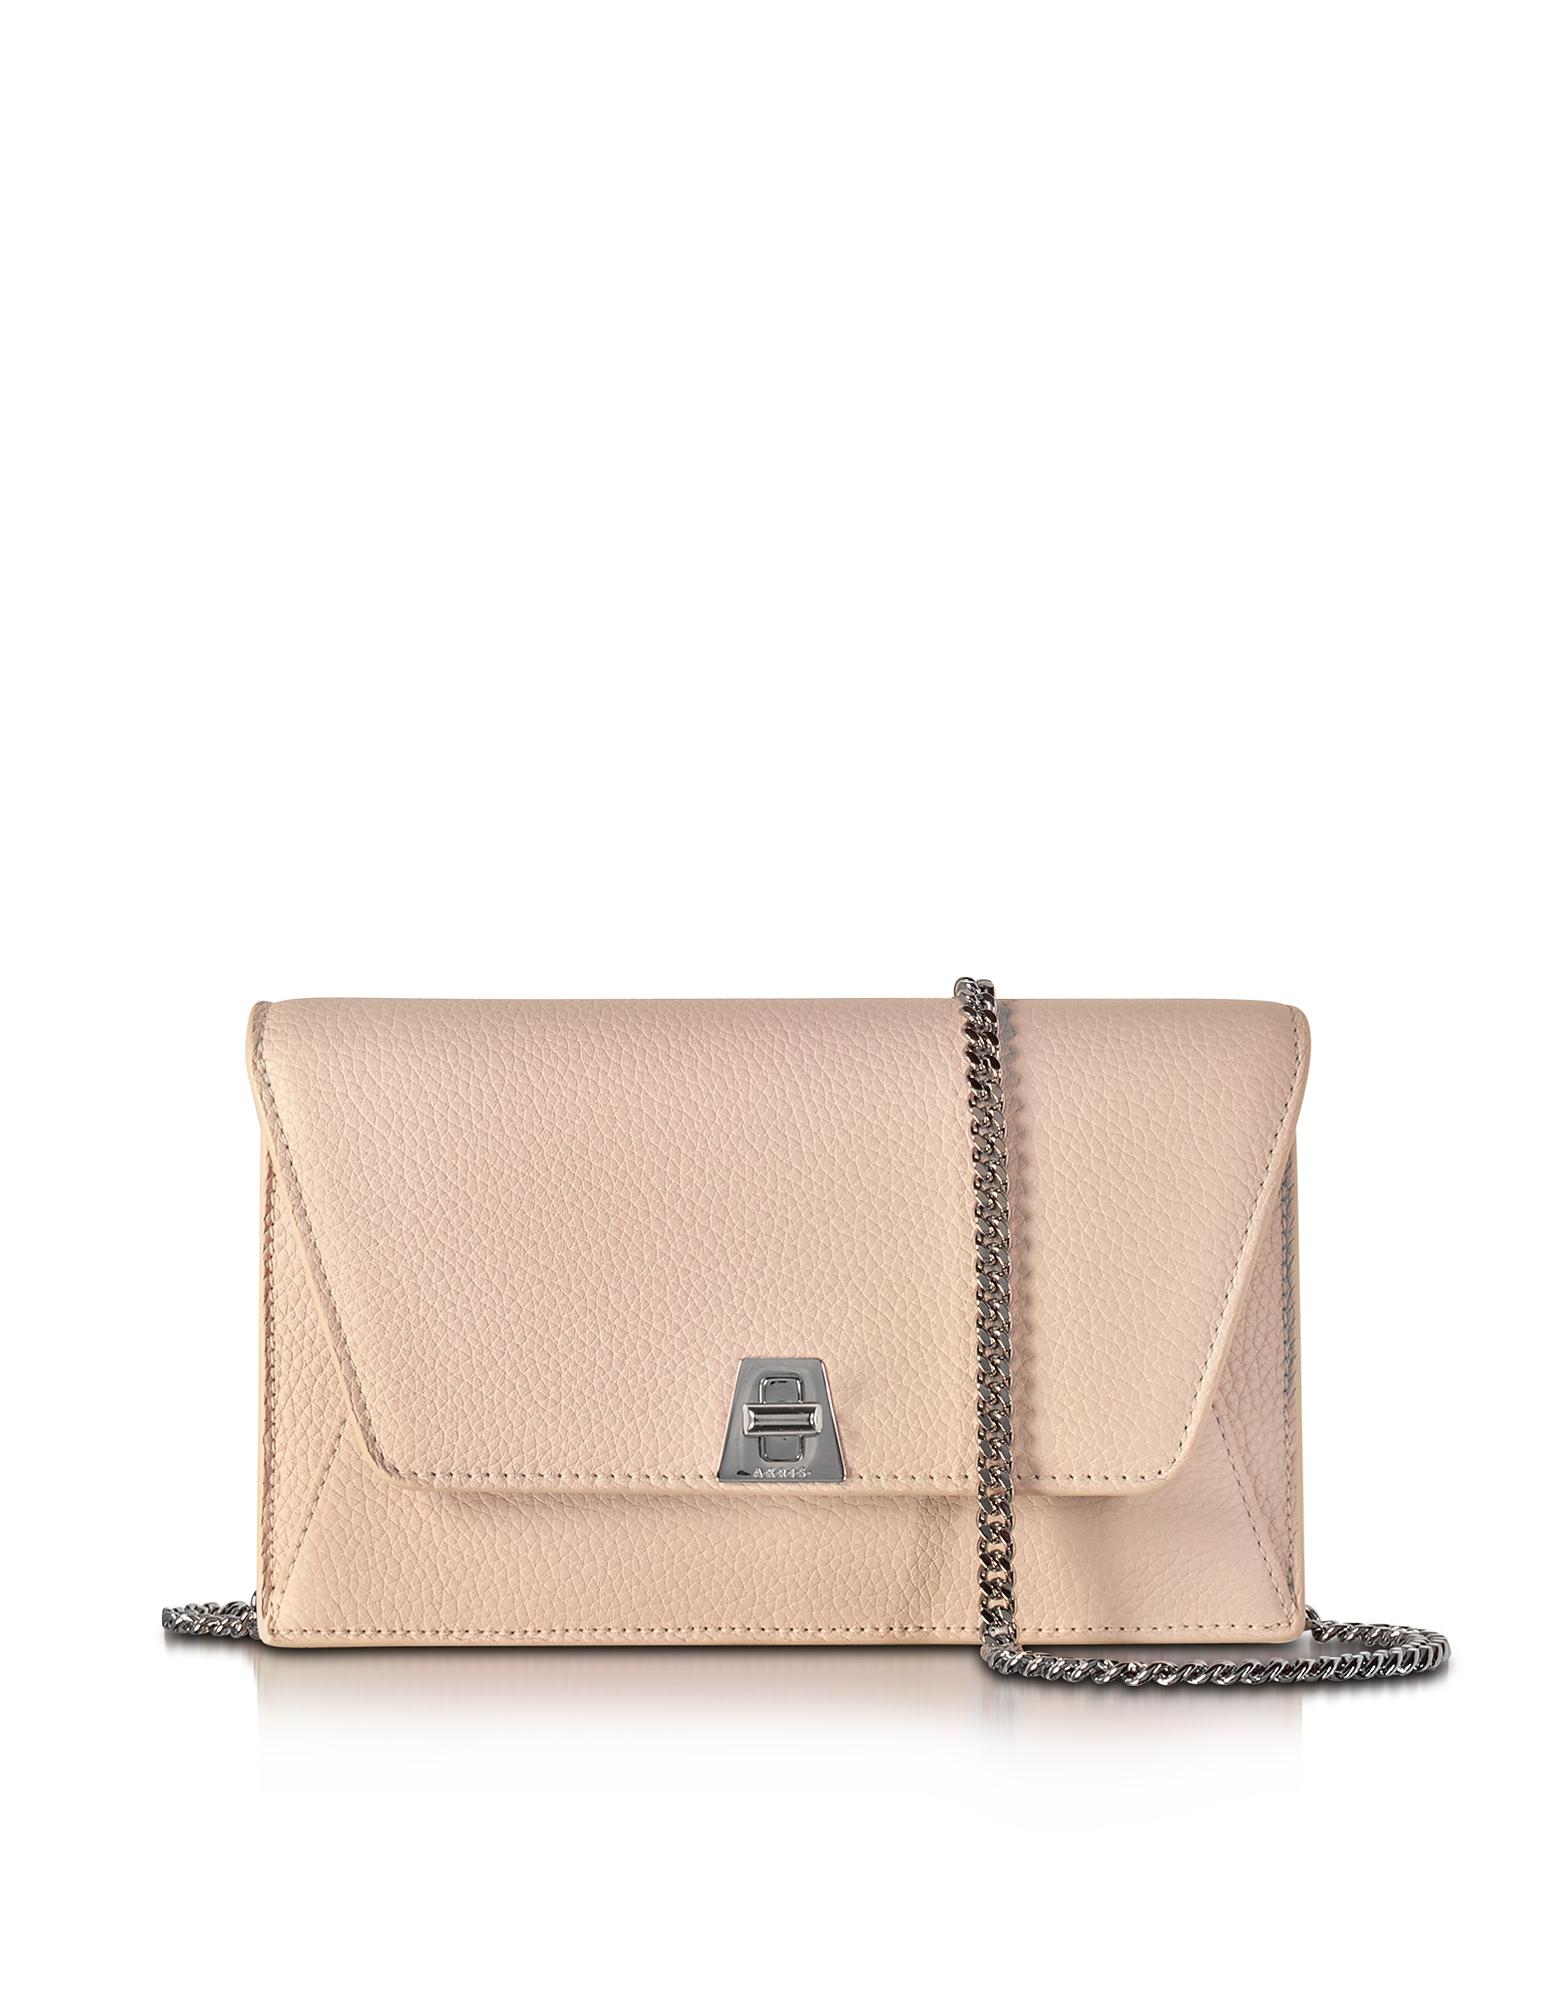 Akris Handbags, Anouk Pale Rose Pebbled Leather Clutch w/Chain